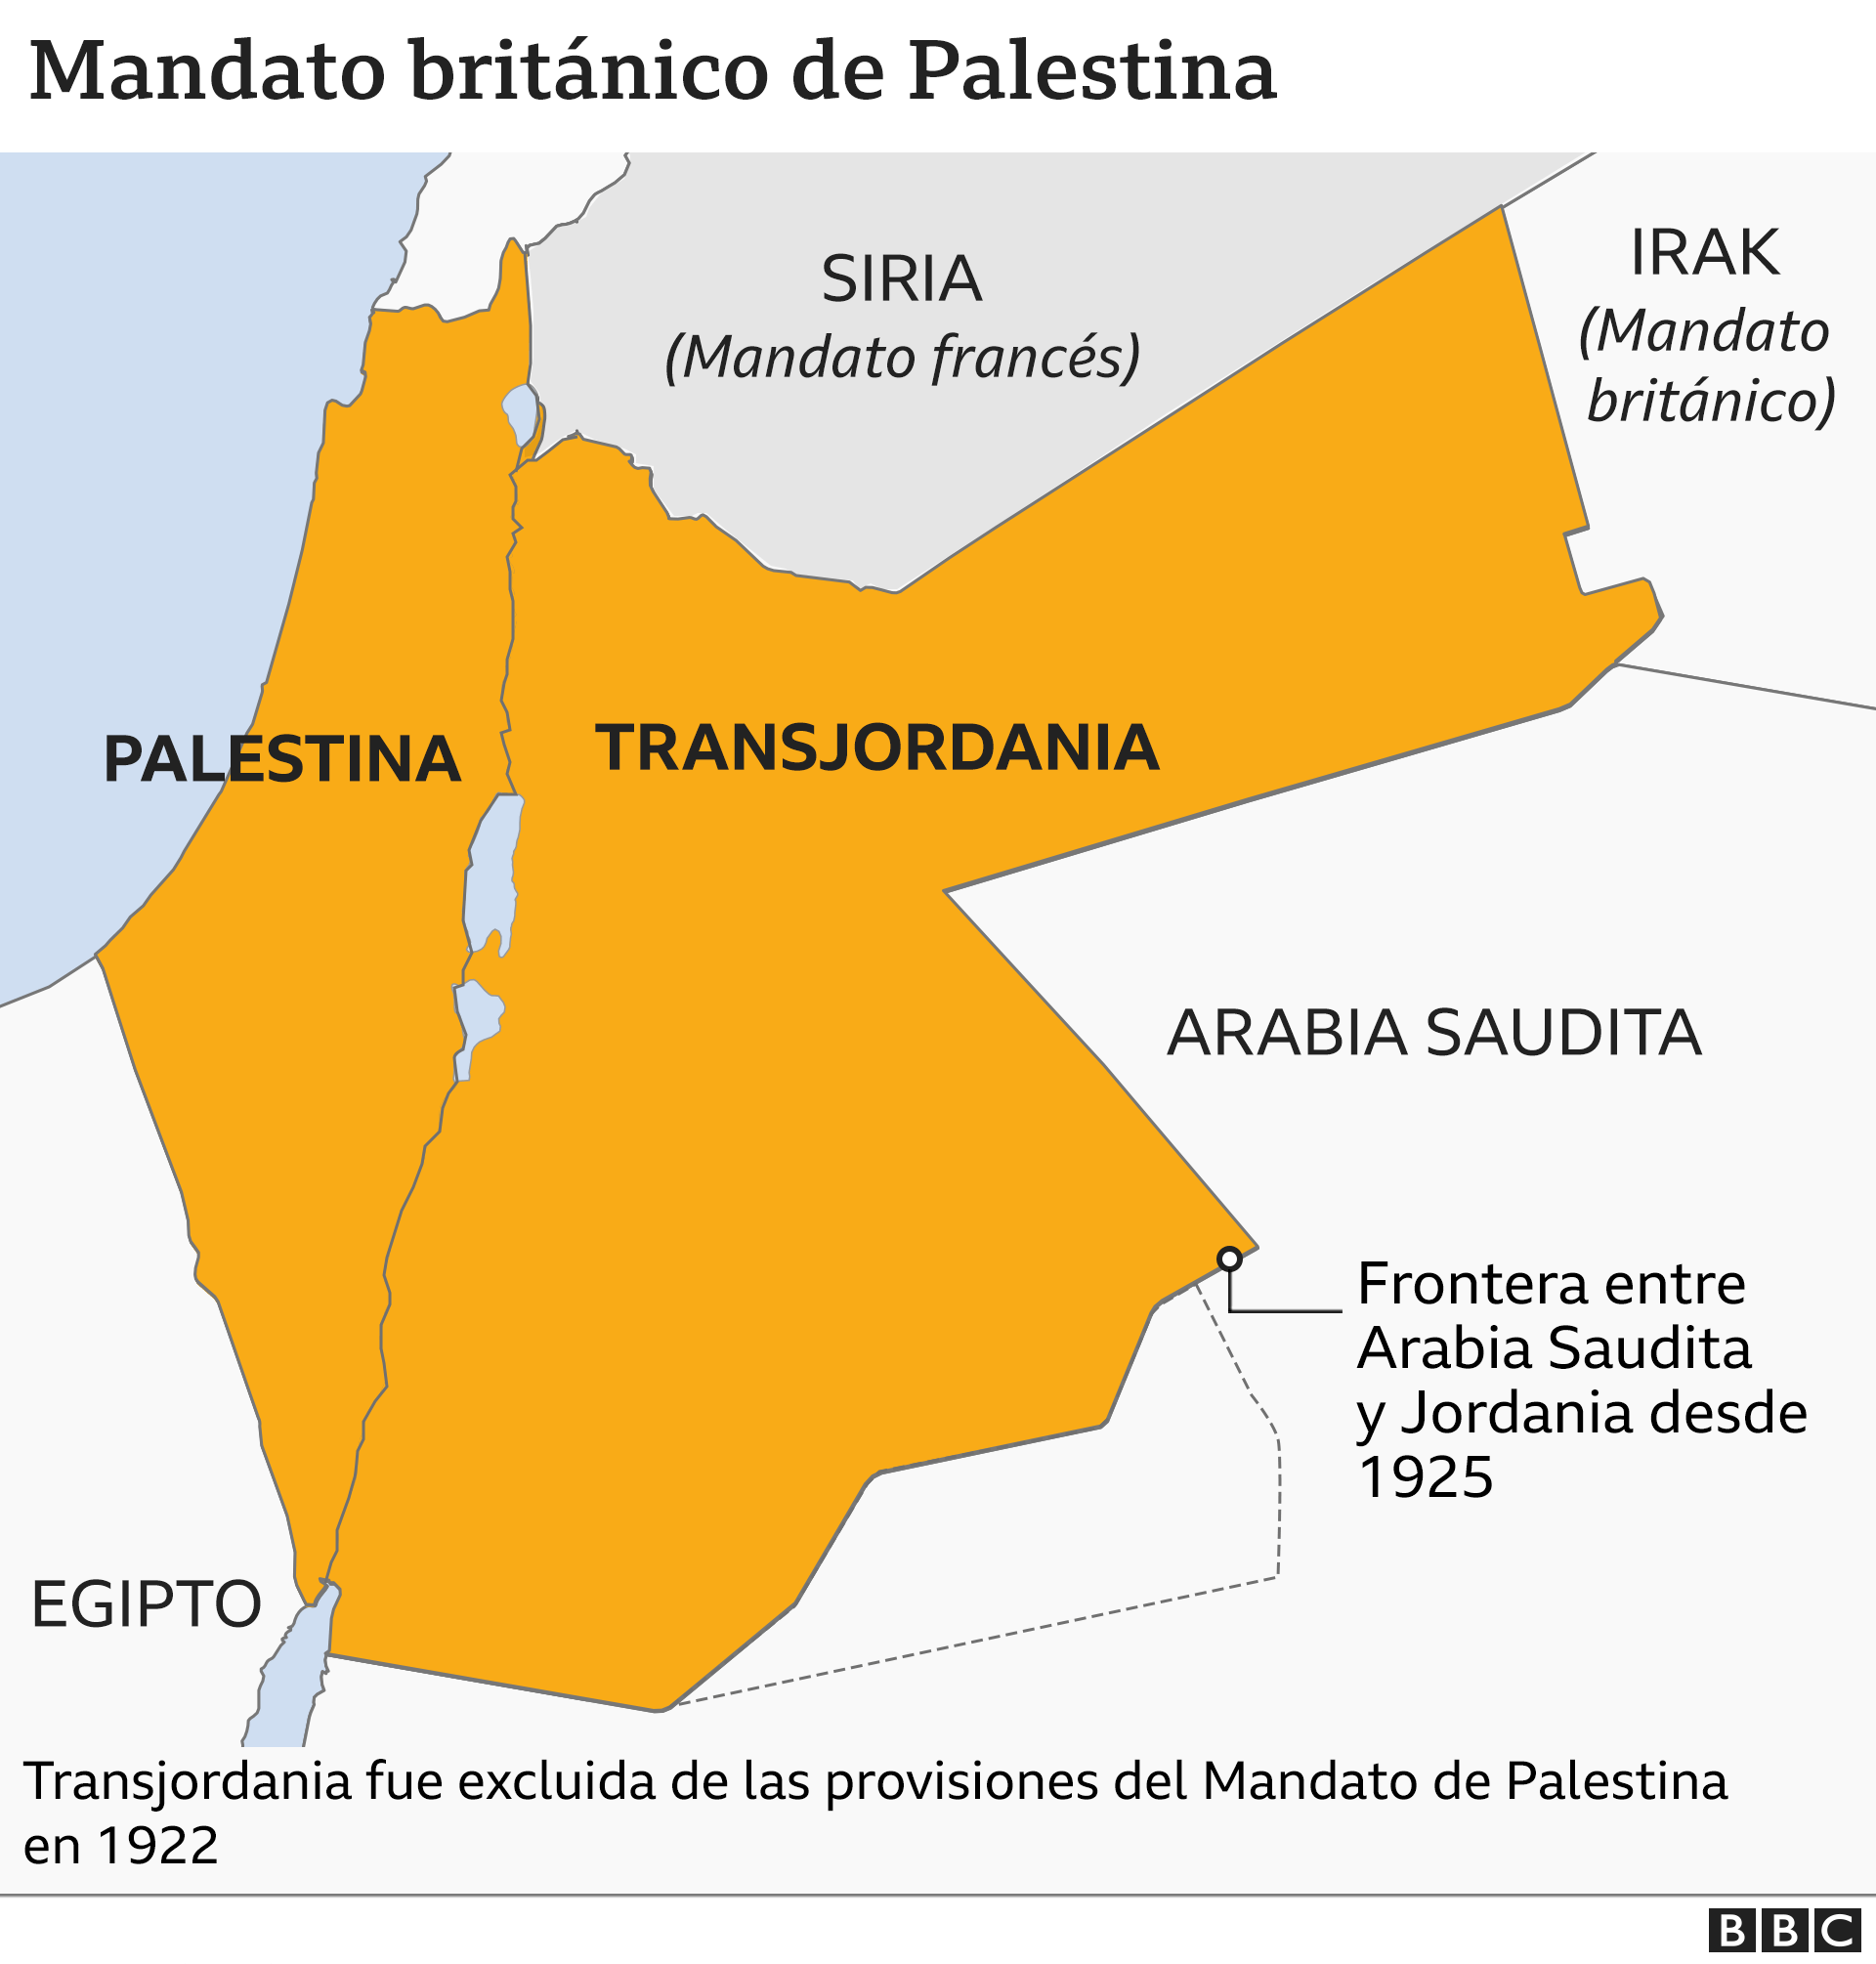 Mapa 1: Mandato británico de Palestina